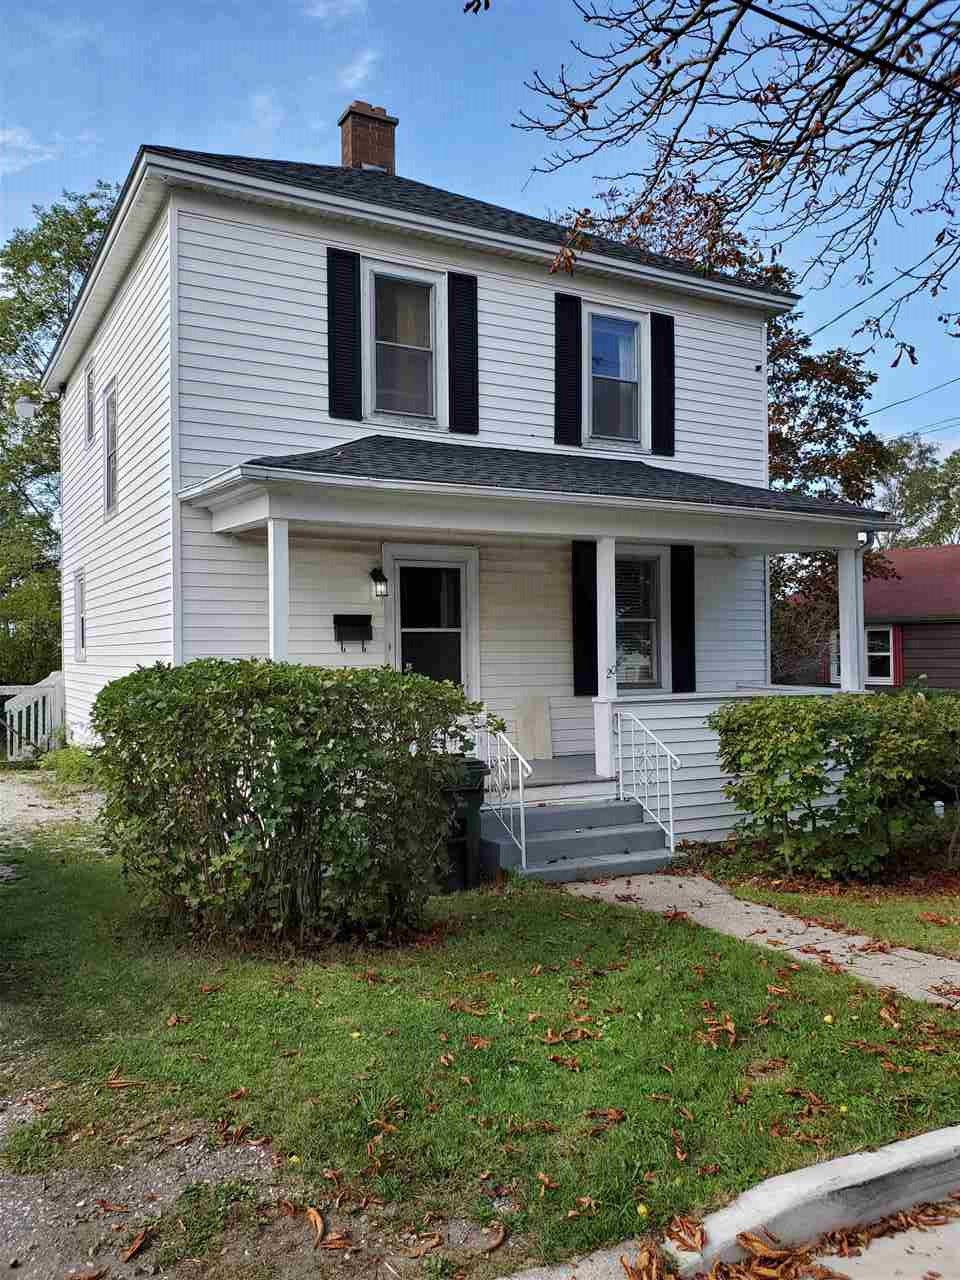 Main Photo: 20 Norwood Avenue in Sydney: 201-Sydney Residential for sale (Cape Breton)  : MLS®# 202021665